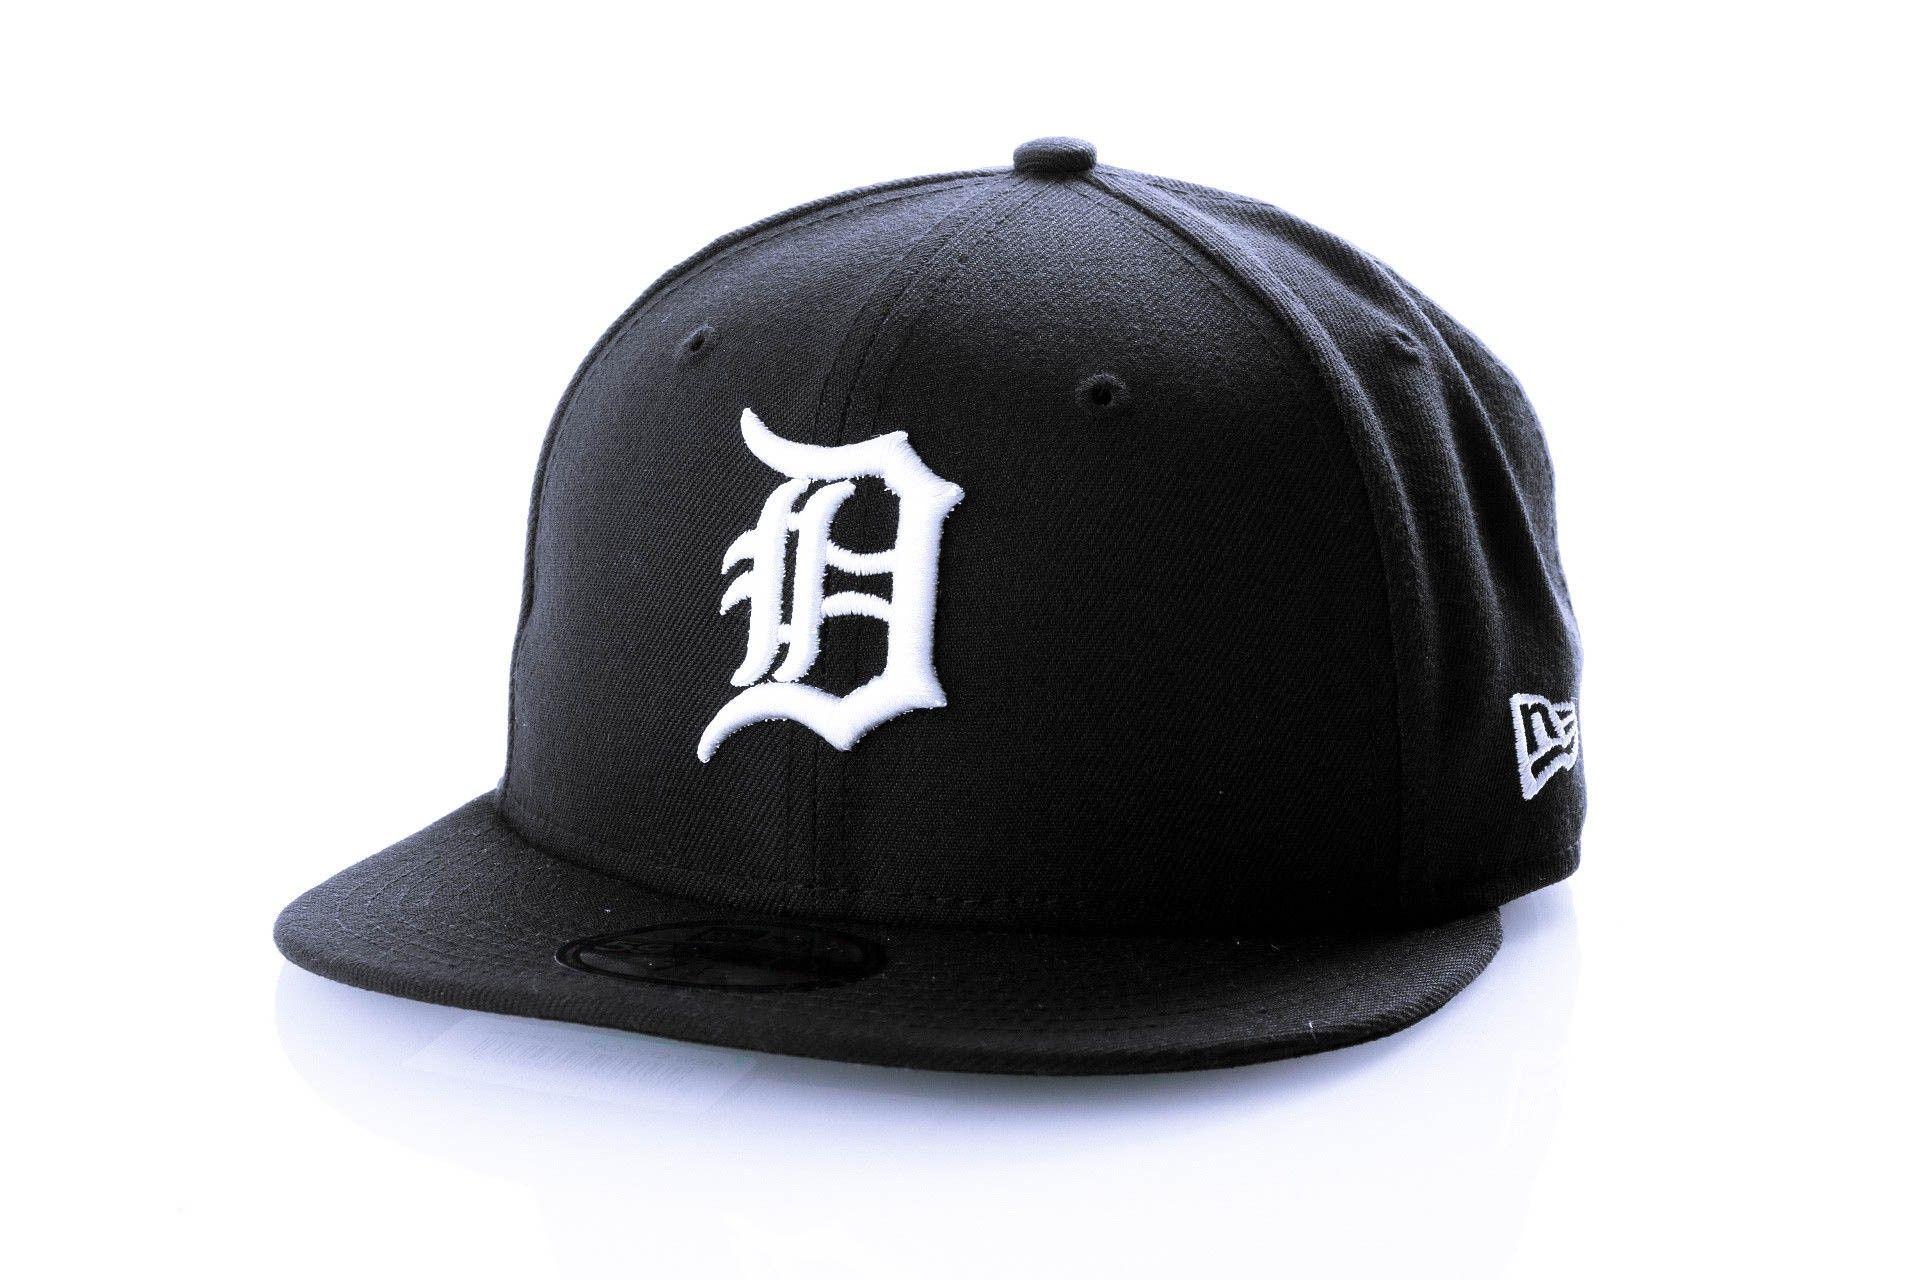 Afbeelding van New Era Fitted Cap Detroit Tigers AC PERF 5950 DETROIT TIGERS 70417640